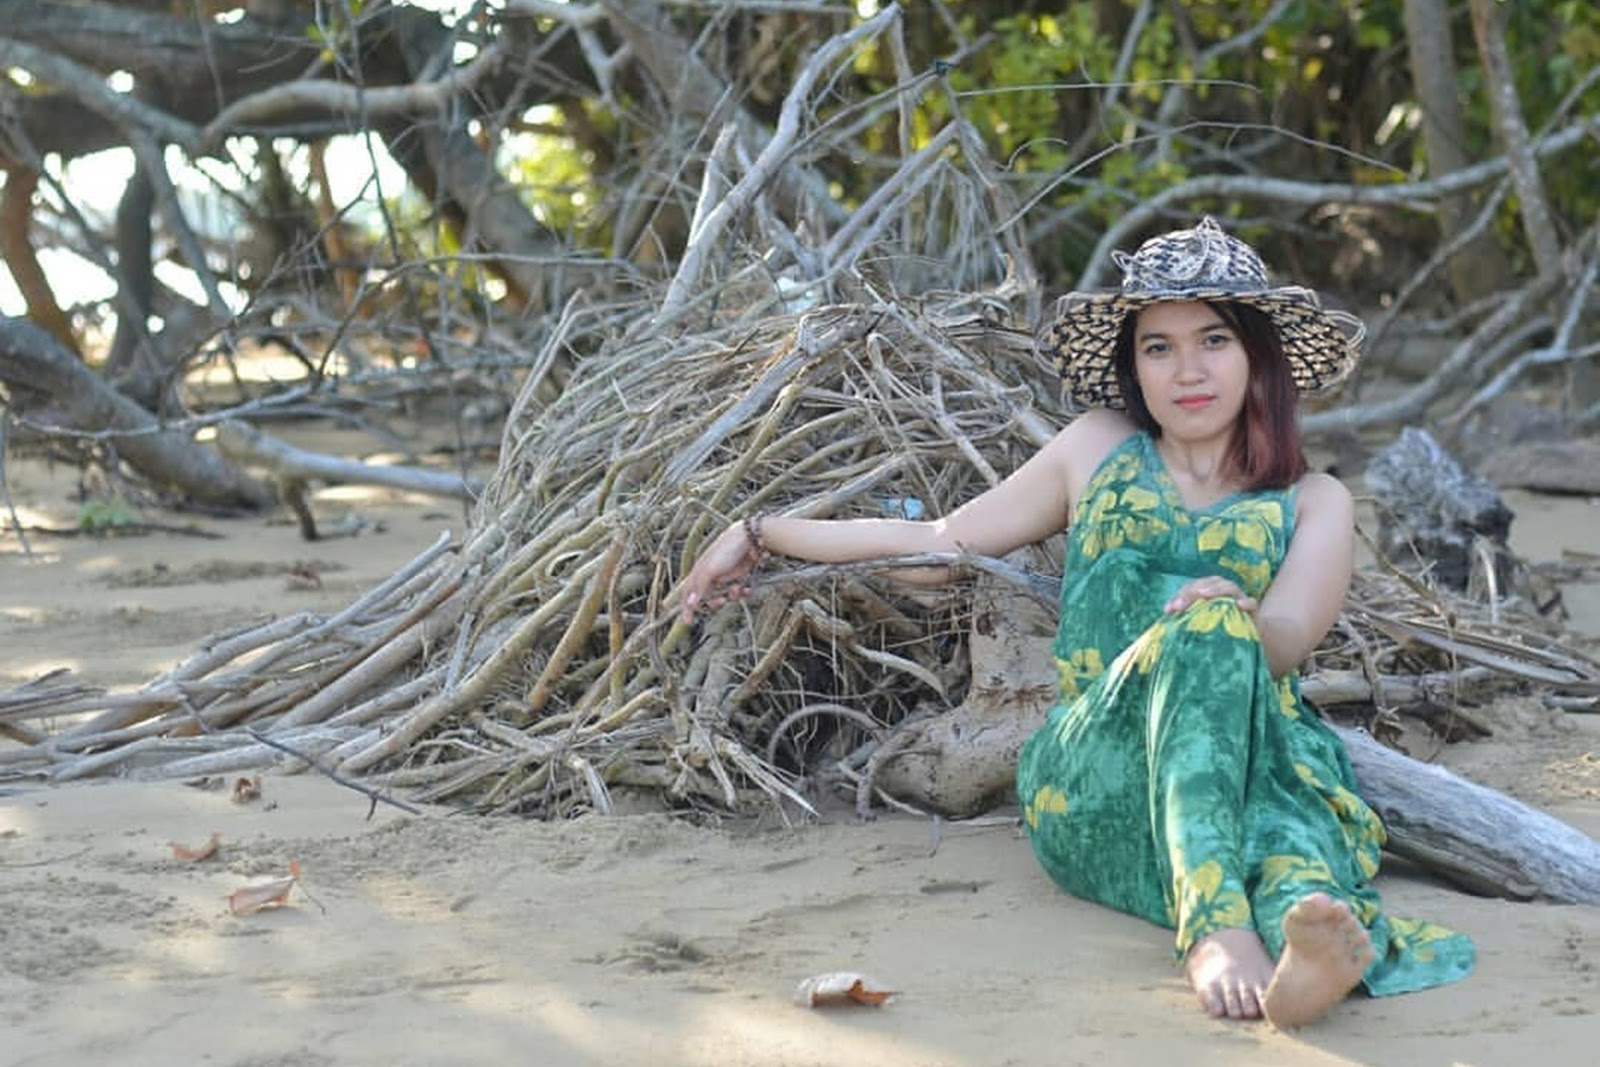 Konsep Foto model yang seuai dengan Cewek IGO gaun